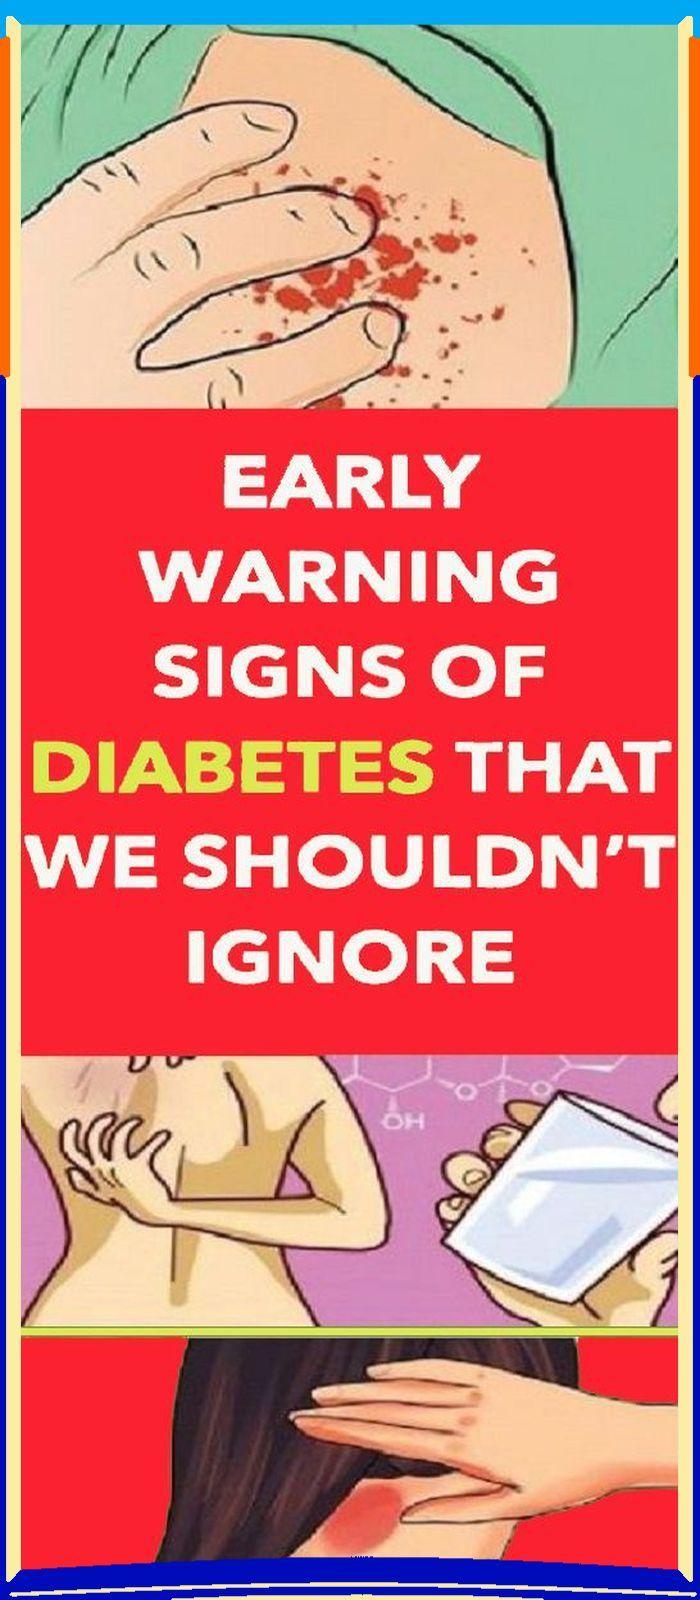 6 SYMPTOMS OF DIABETES YOU NEED TO KNOW